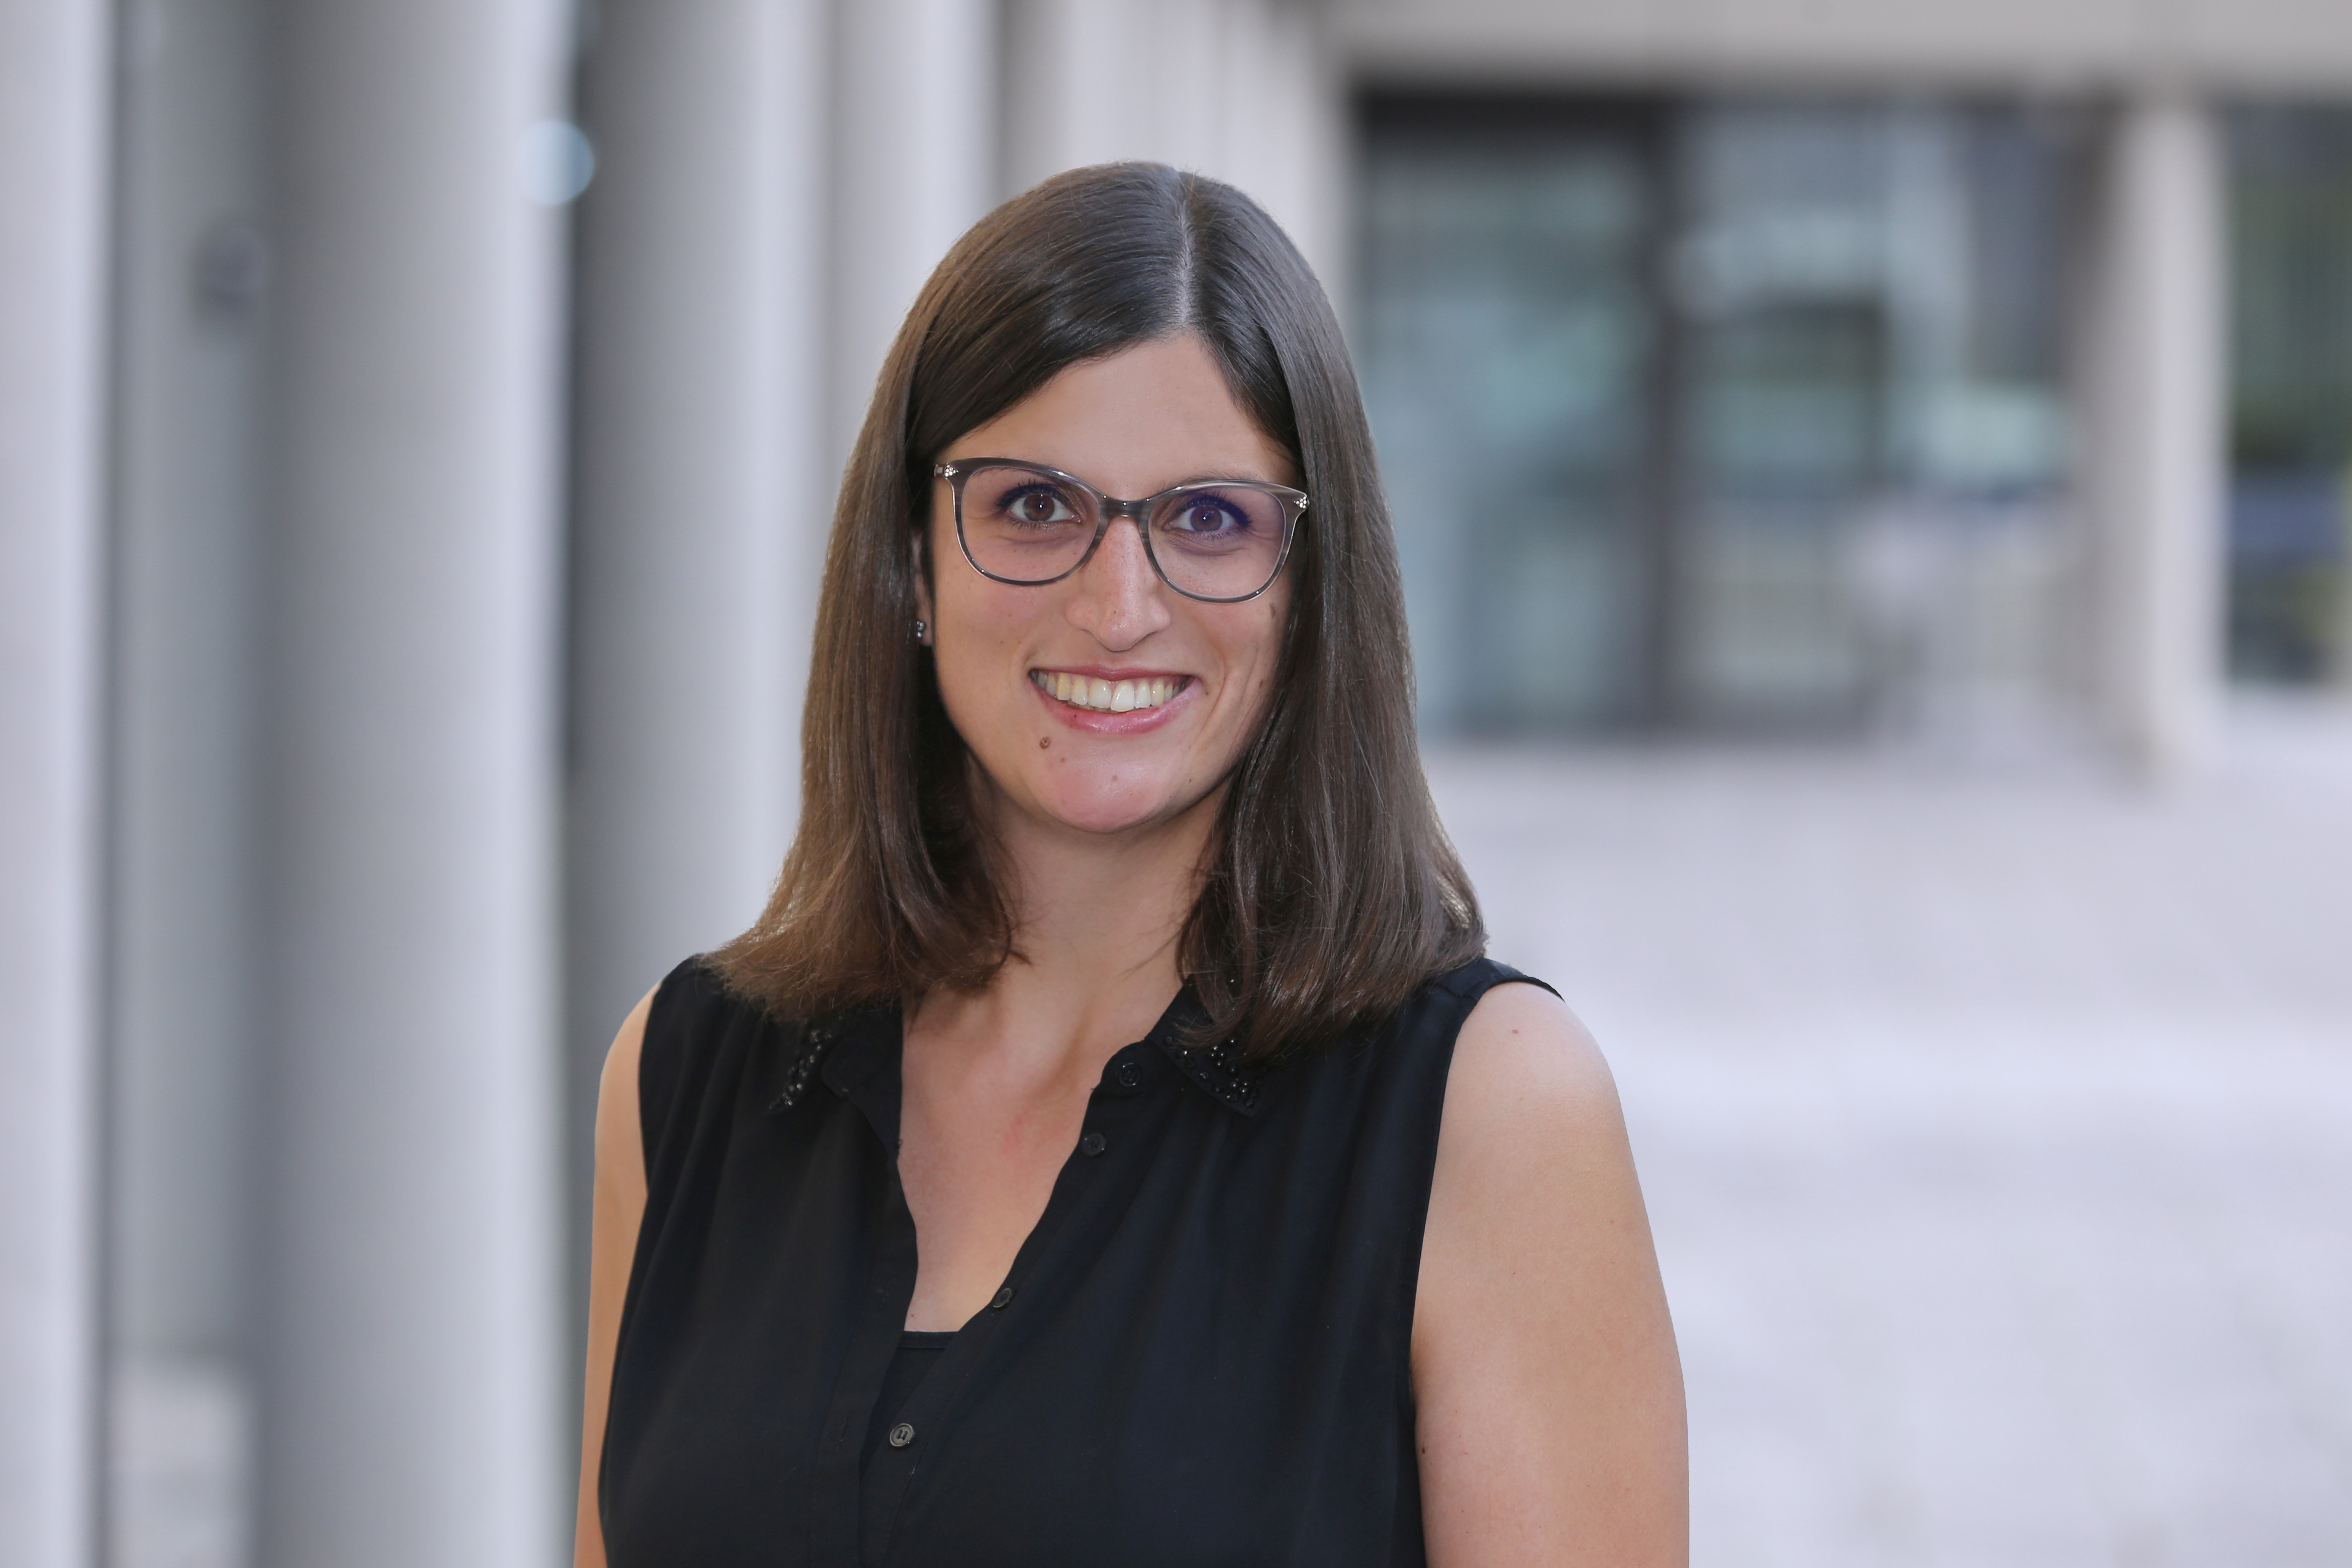 Alena Letscher, HR & Controlling